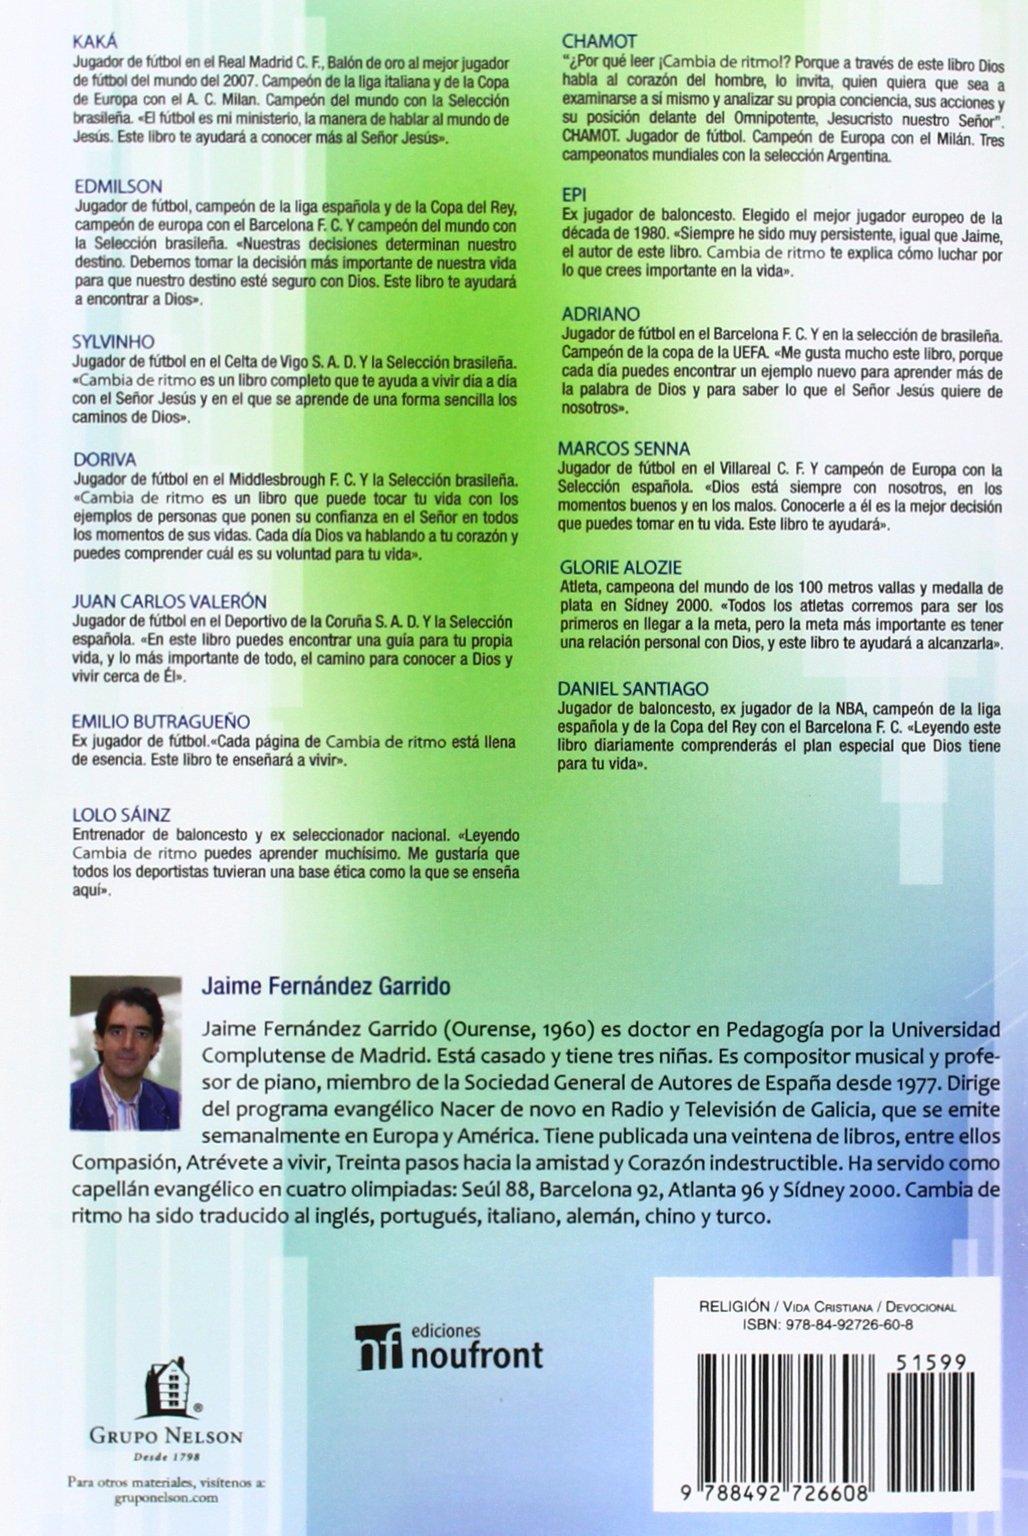 Cambia de Ritmo / Change of Pace (Spanish Edition): Jaime Fernandez Garrido: 9788492726608: Amazon.com: Books